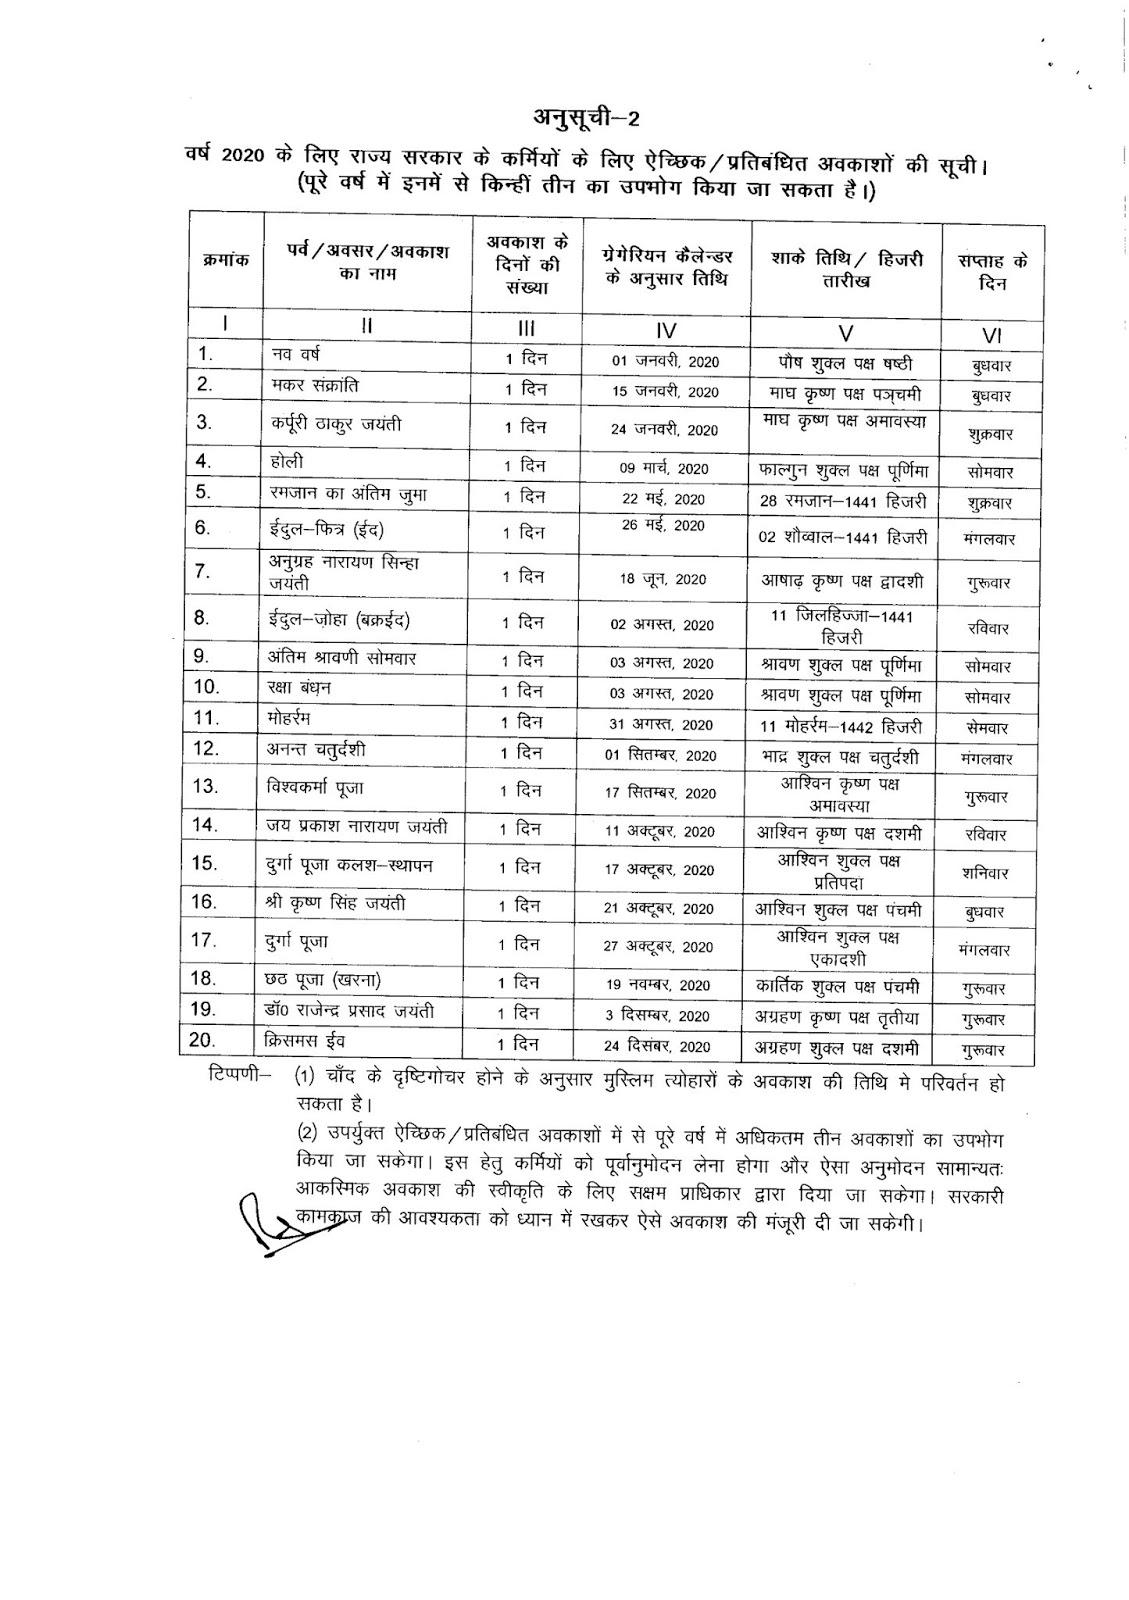 Bihar Government Calendar 2020 #Educratsweb throughout Calendar 2018 Bihar Sarkar